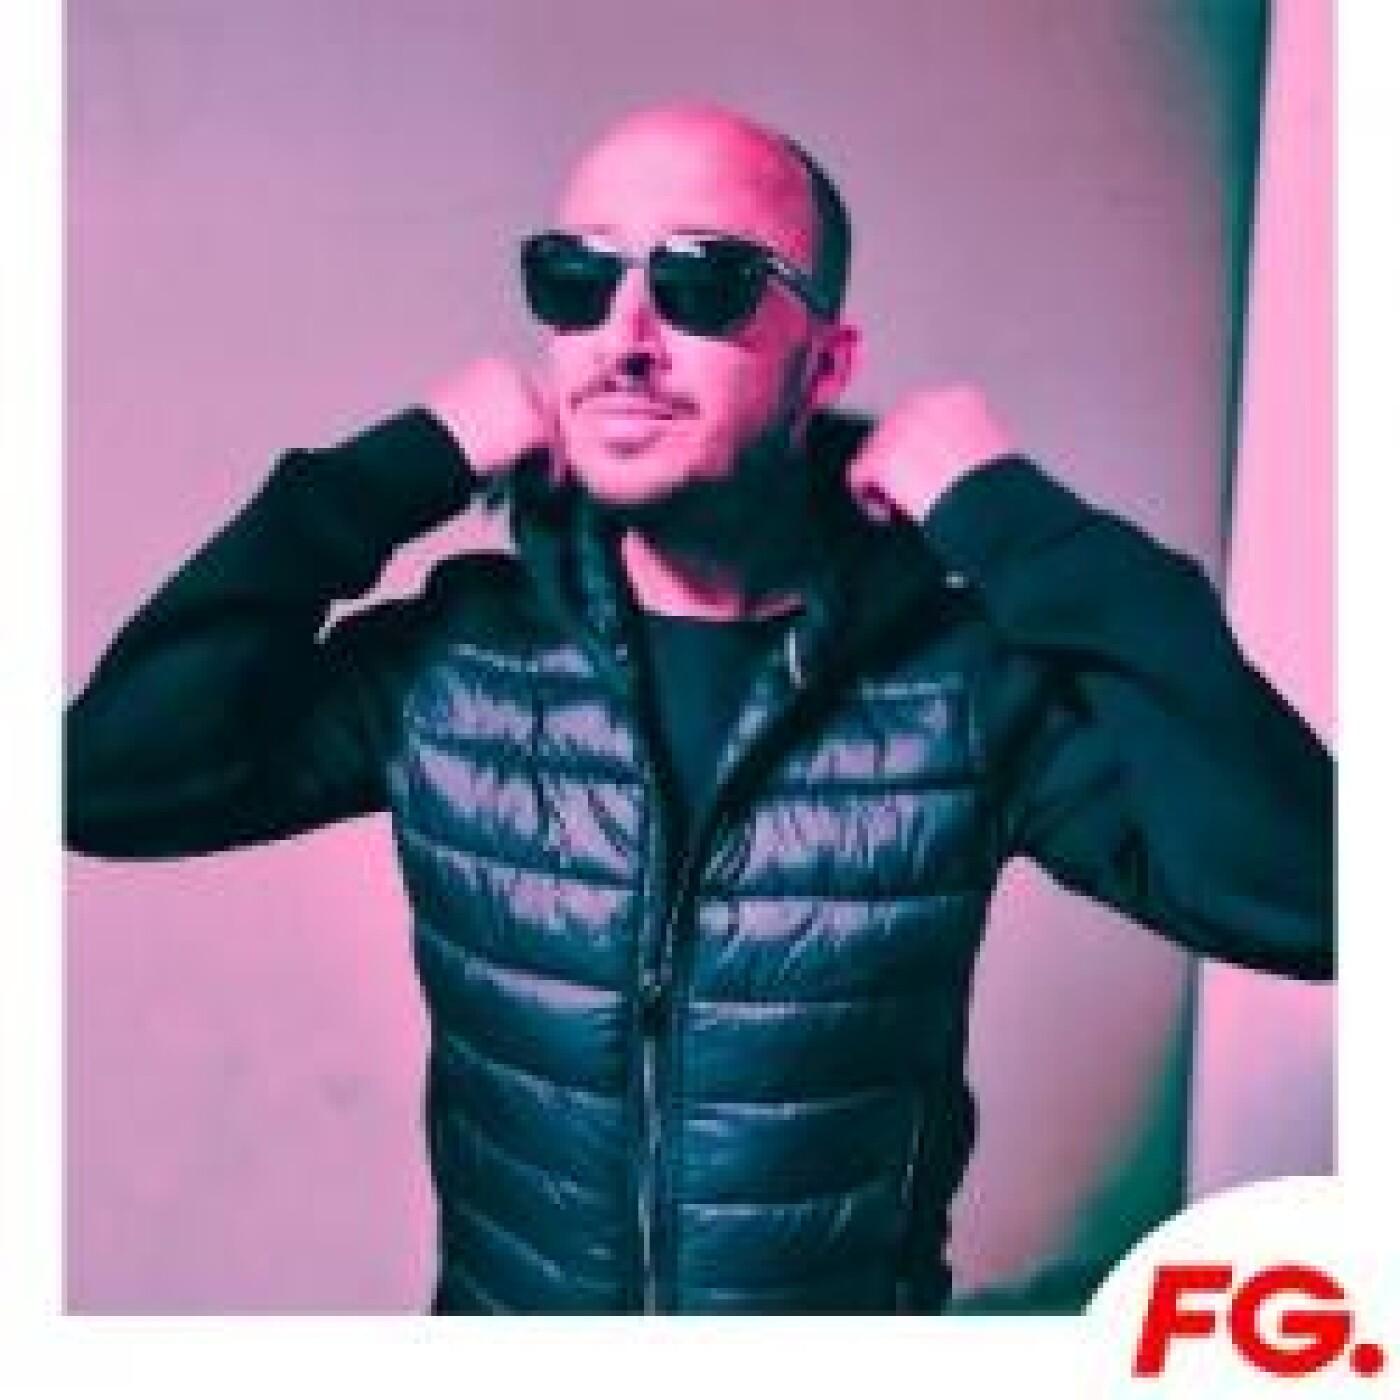 CLUB FG : SEBASTIEN ALEGR